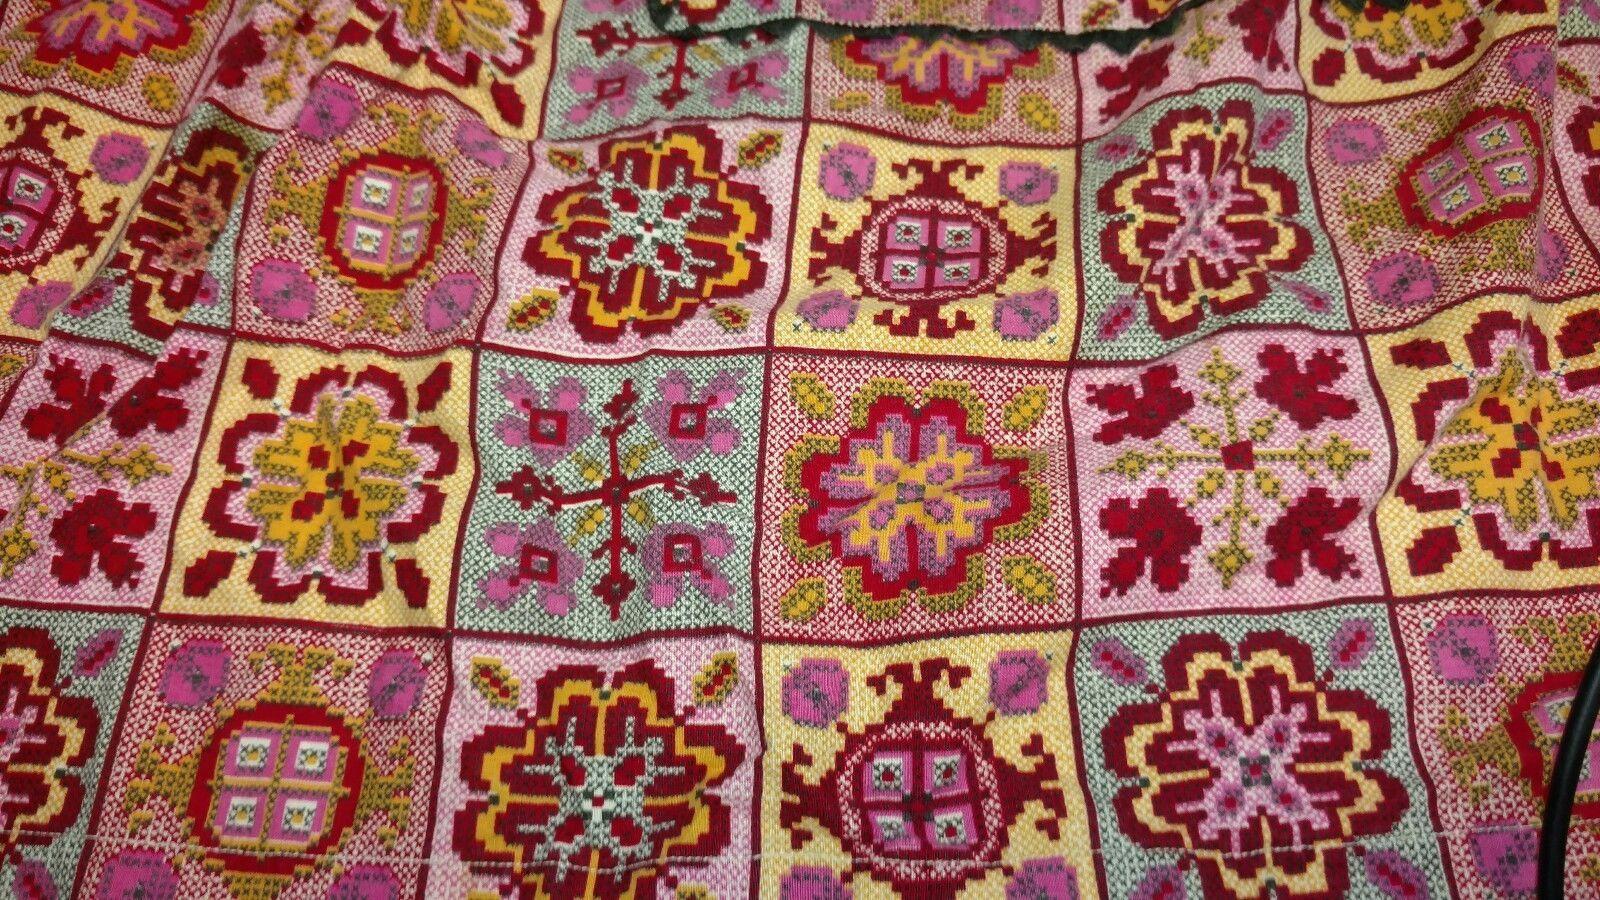 Gorgeous Vintage Apron Beautiful Bold Bright Colors Handmade - $7.69